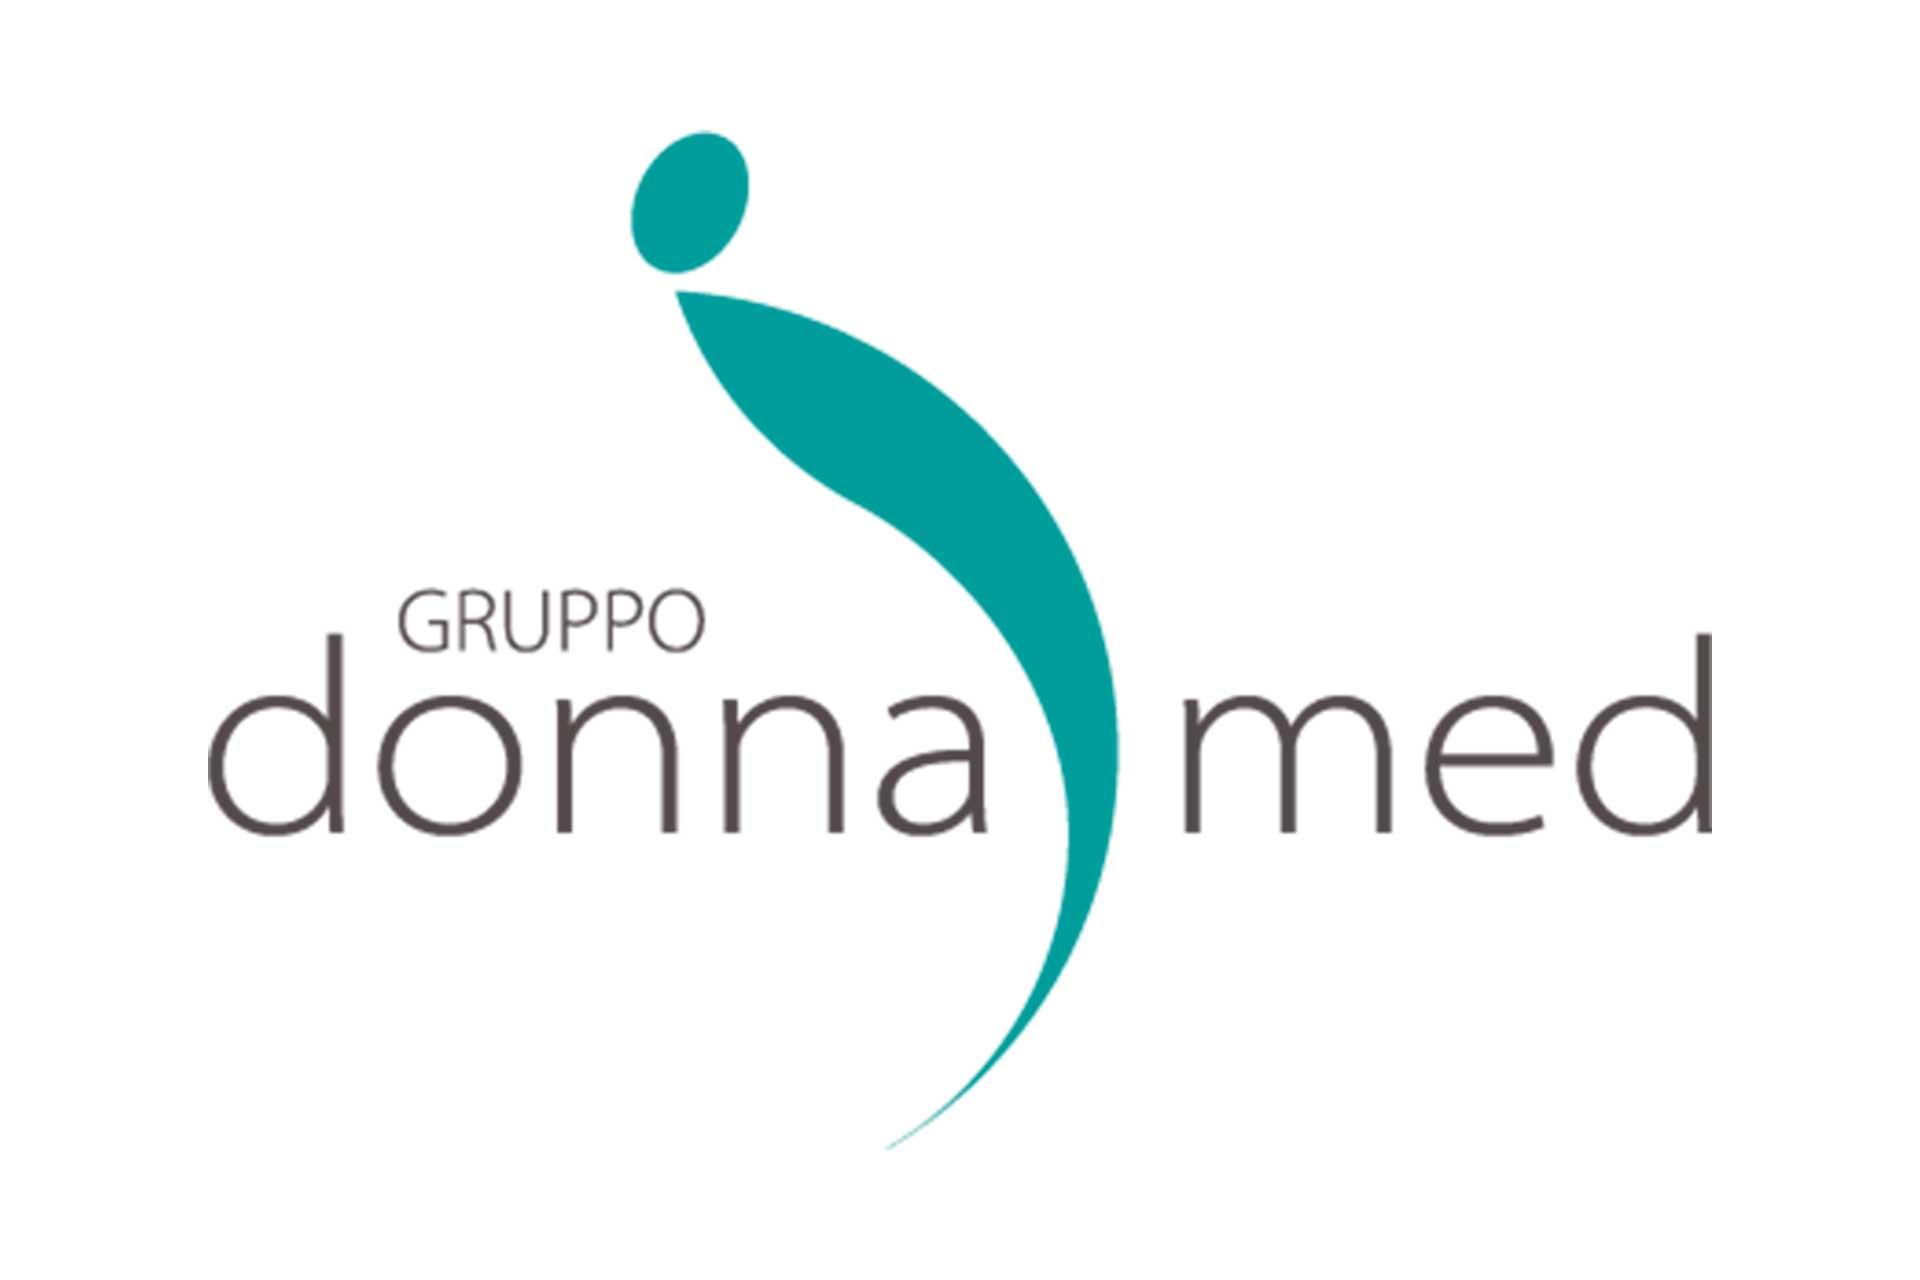 Gruppo Donnamed